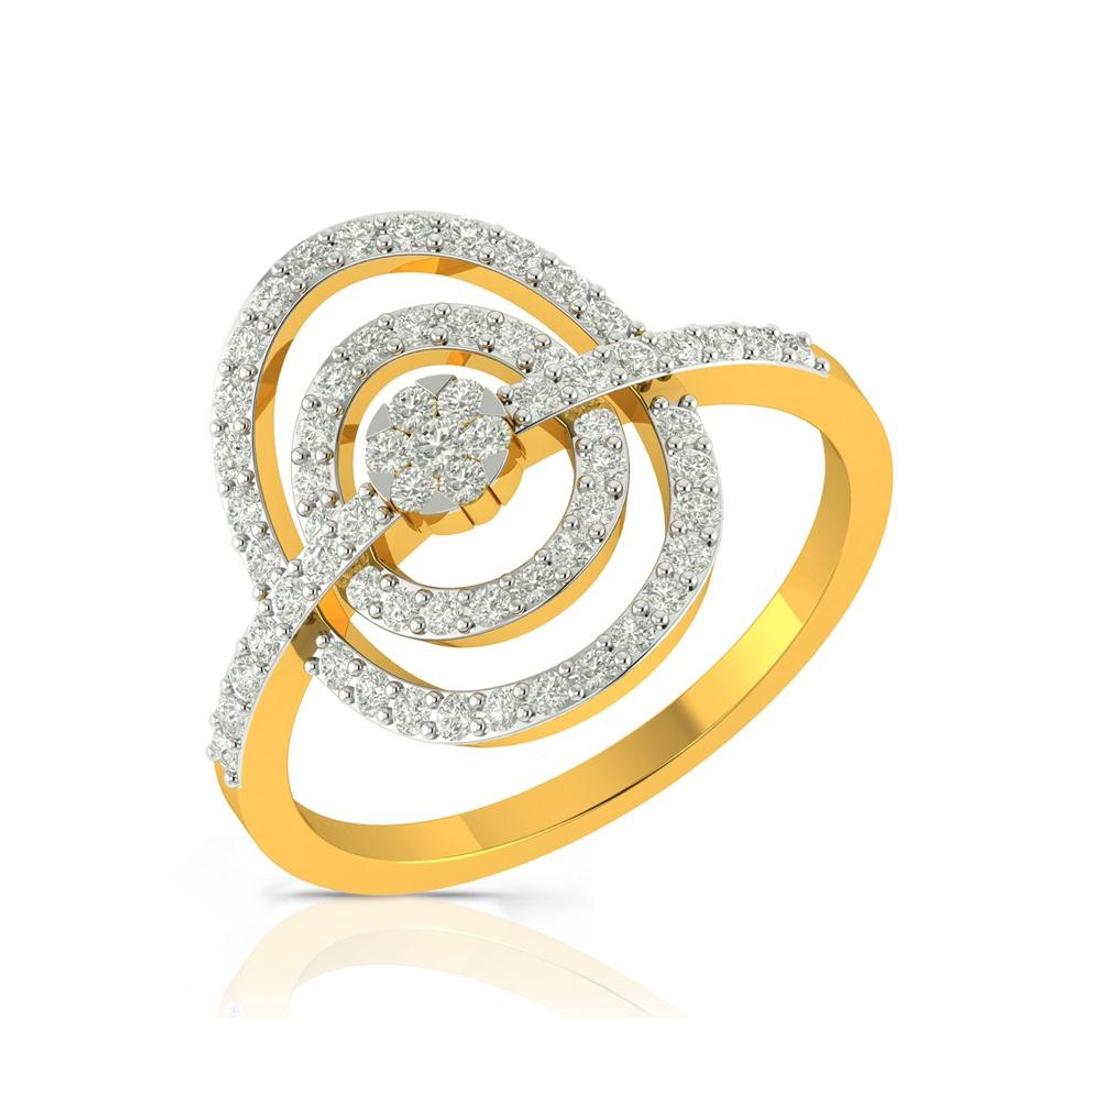 Buy Charu Jewels Diamond Ladies Ring CJLR0513 Online in India